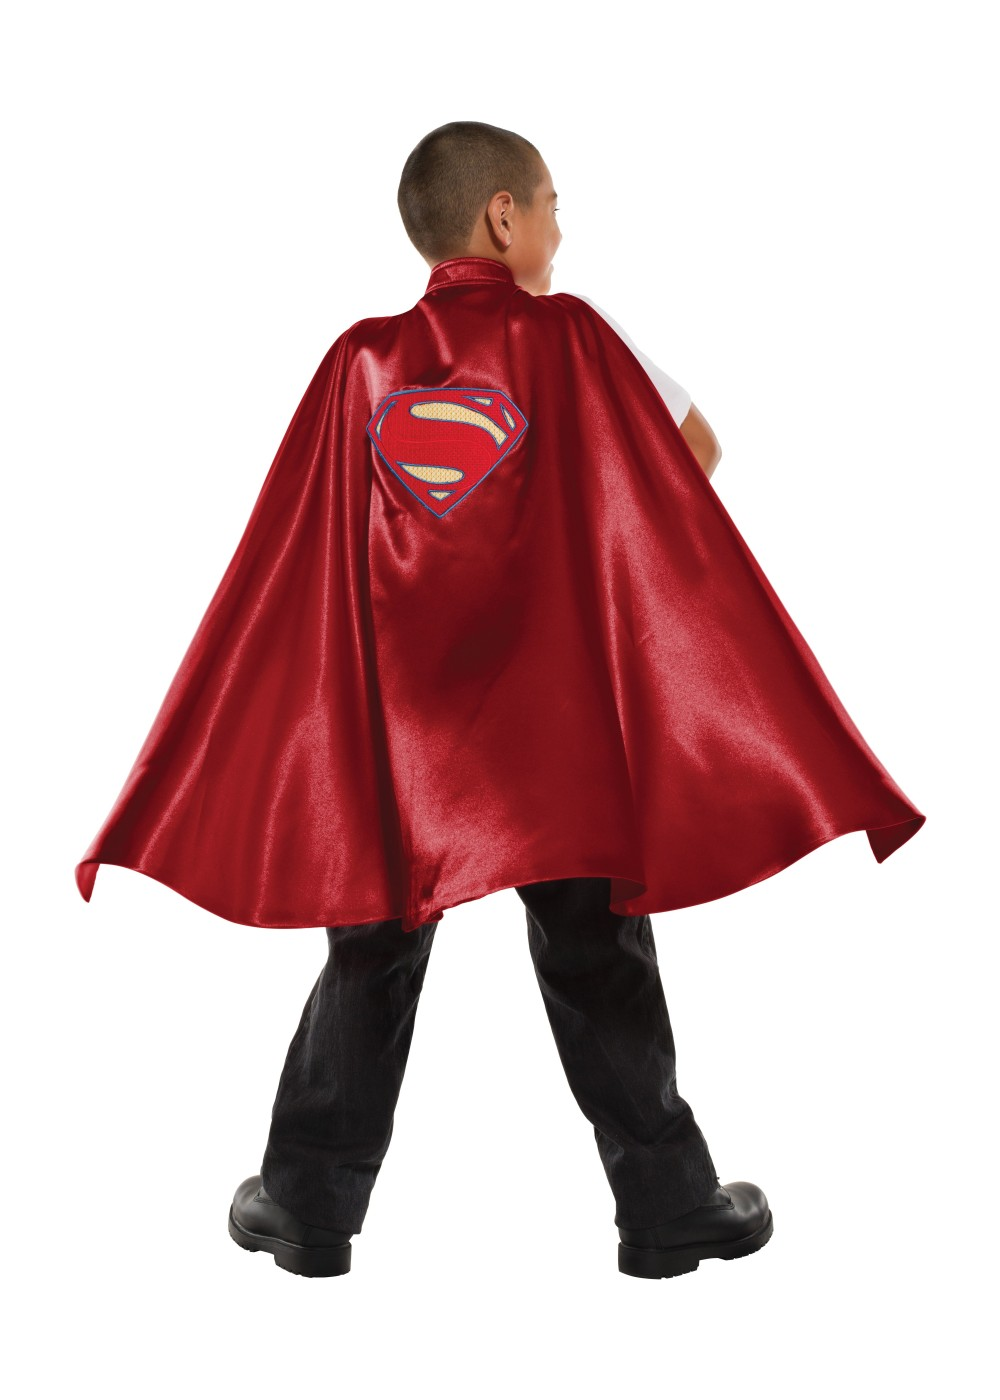 Plus Superhero Size